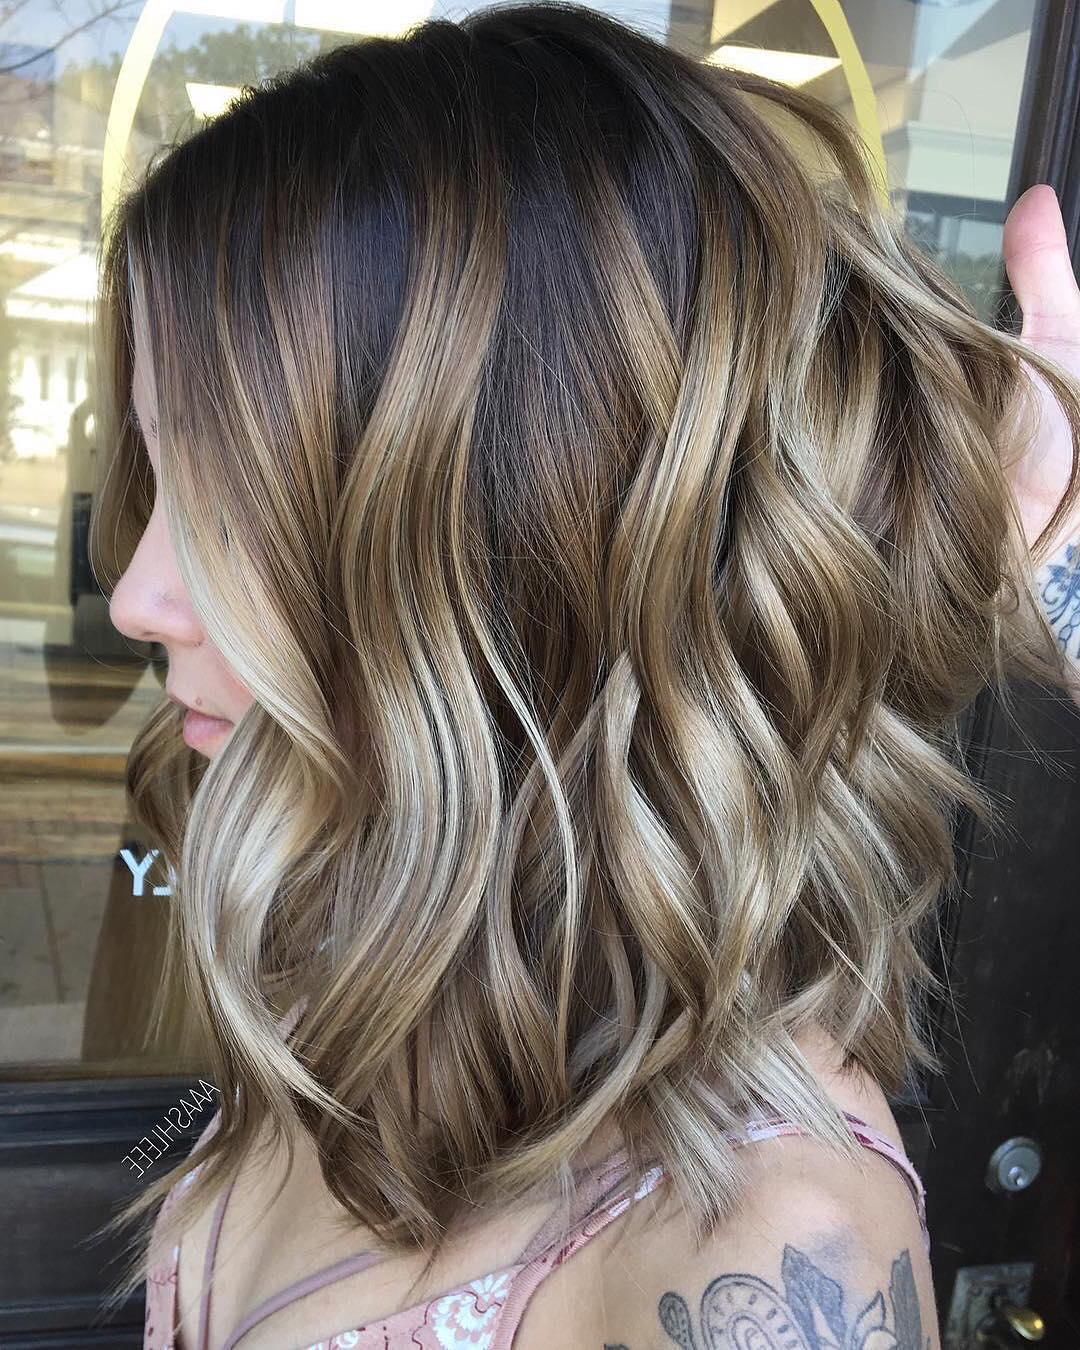 Brown and blonde balayage medium length hair